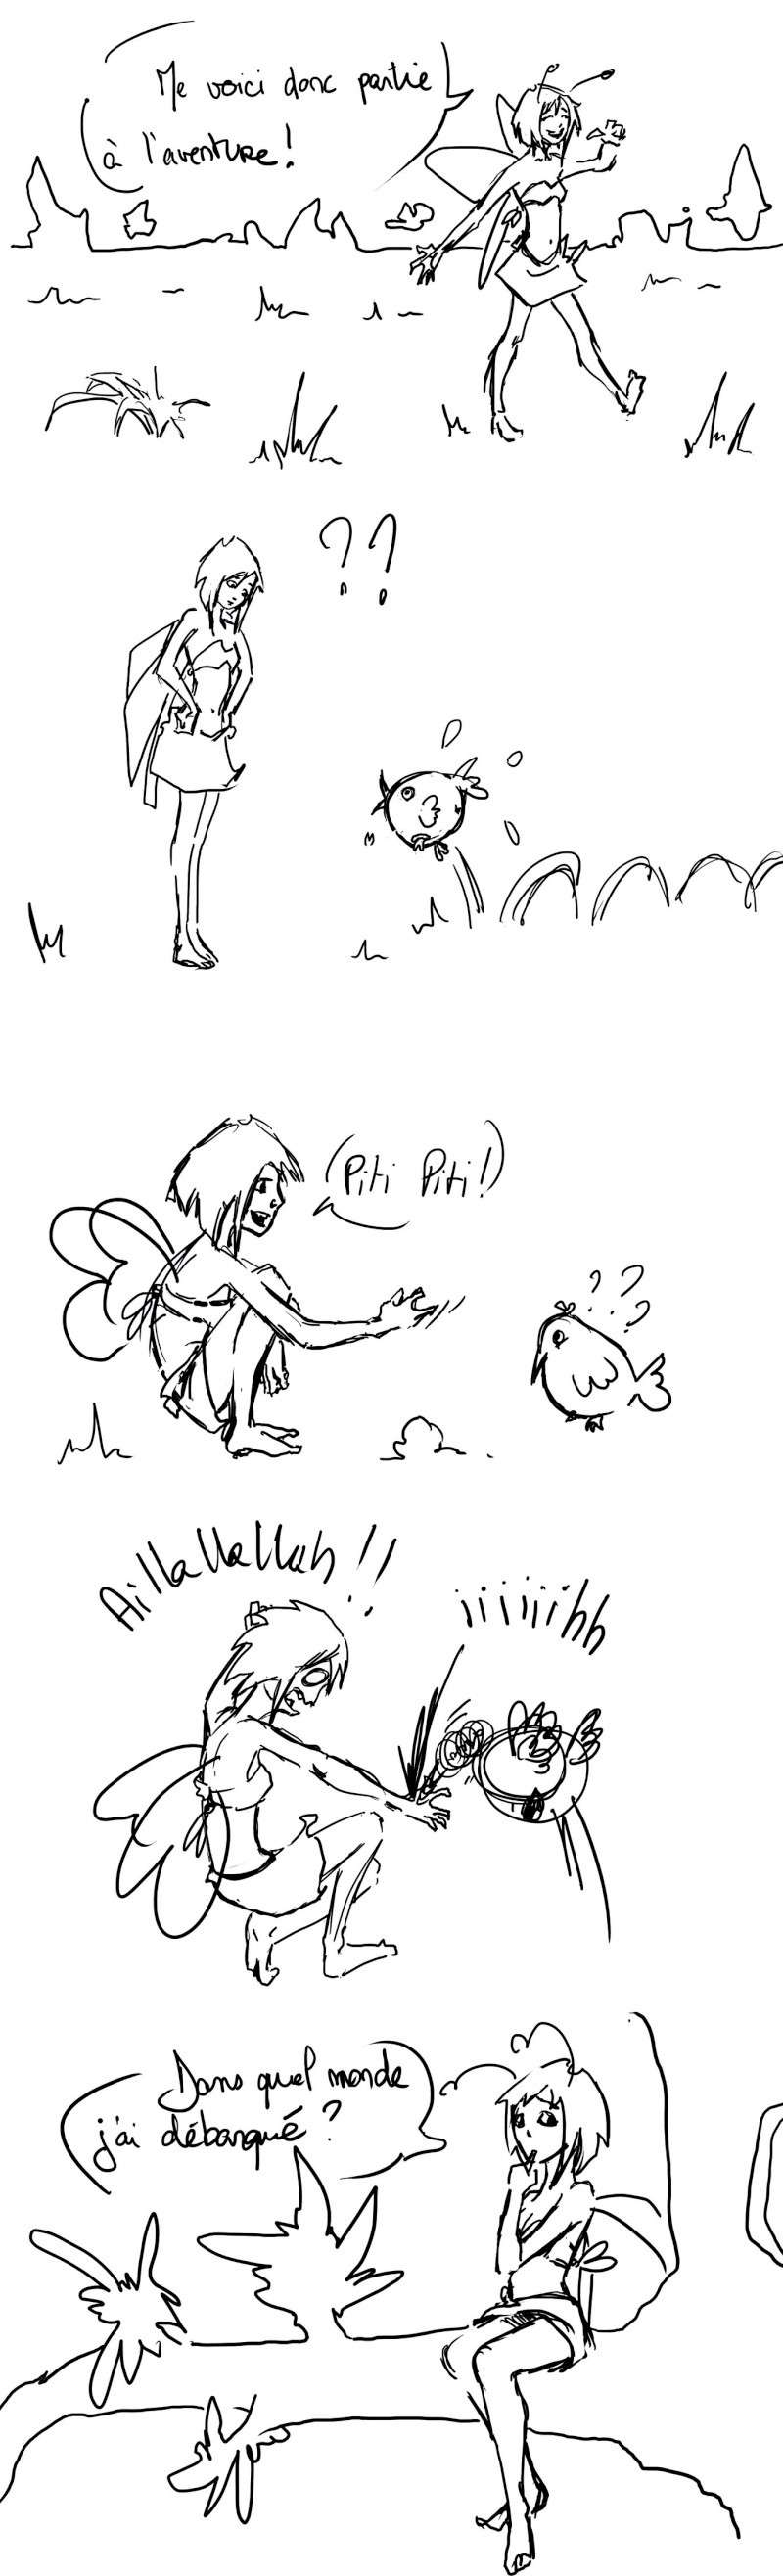 seik et ekis, les aventures ILLUSTREES - Page 5 Strip210